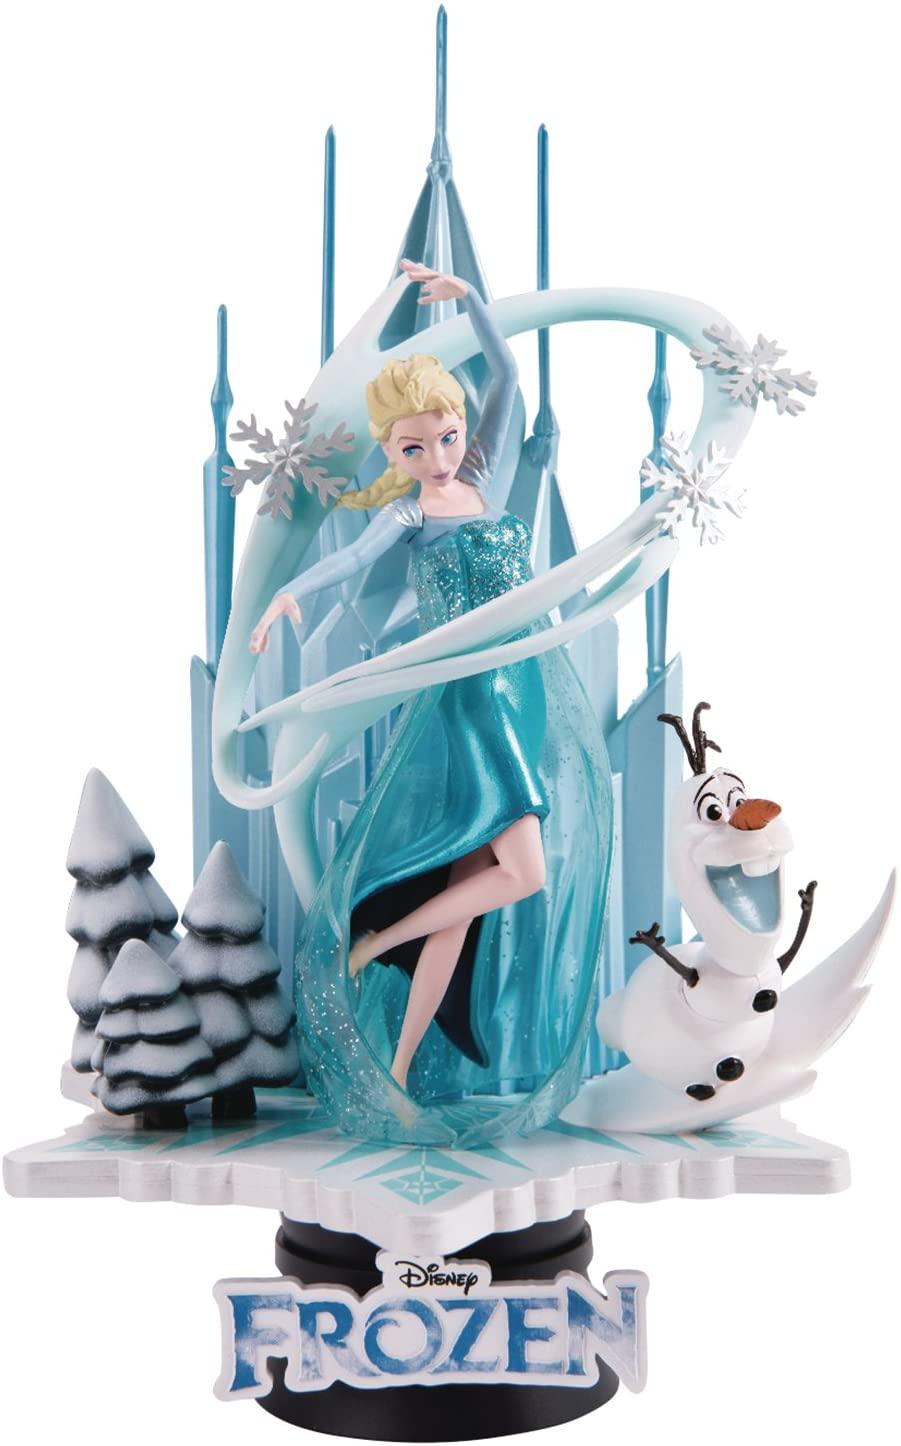 Beast Kingdom Frozen Ds-005 D-Select Series Statue